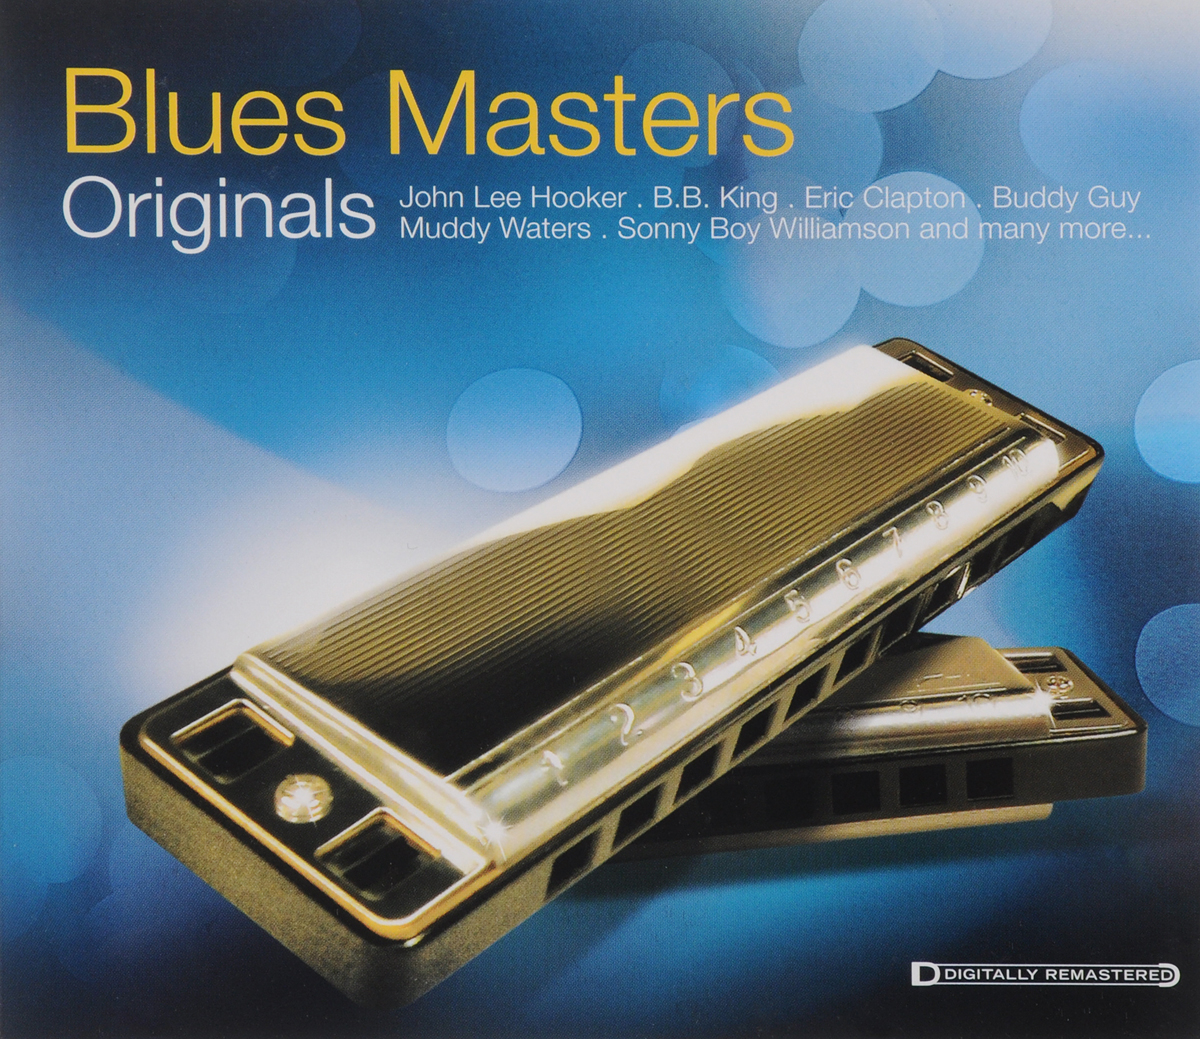 Джон Ли Хукер,Мадди Уотерс,Элмор Джеймс,Би Би Кинг,Мемфис Слим,Лайтнин Хопкинс,Сонни Бой Вильямсон,Джимми Рид,Эрик Клэптон,Лидбелли Blues Masters. Originals джон рид вдоль фронта